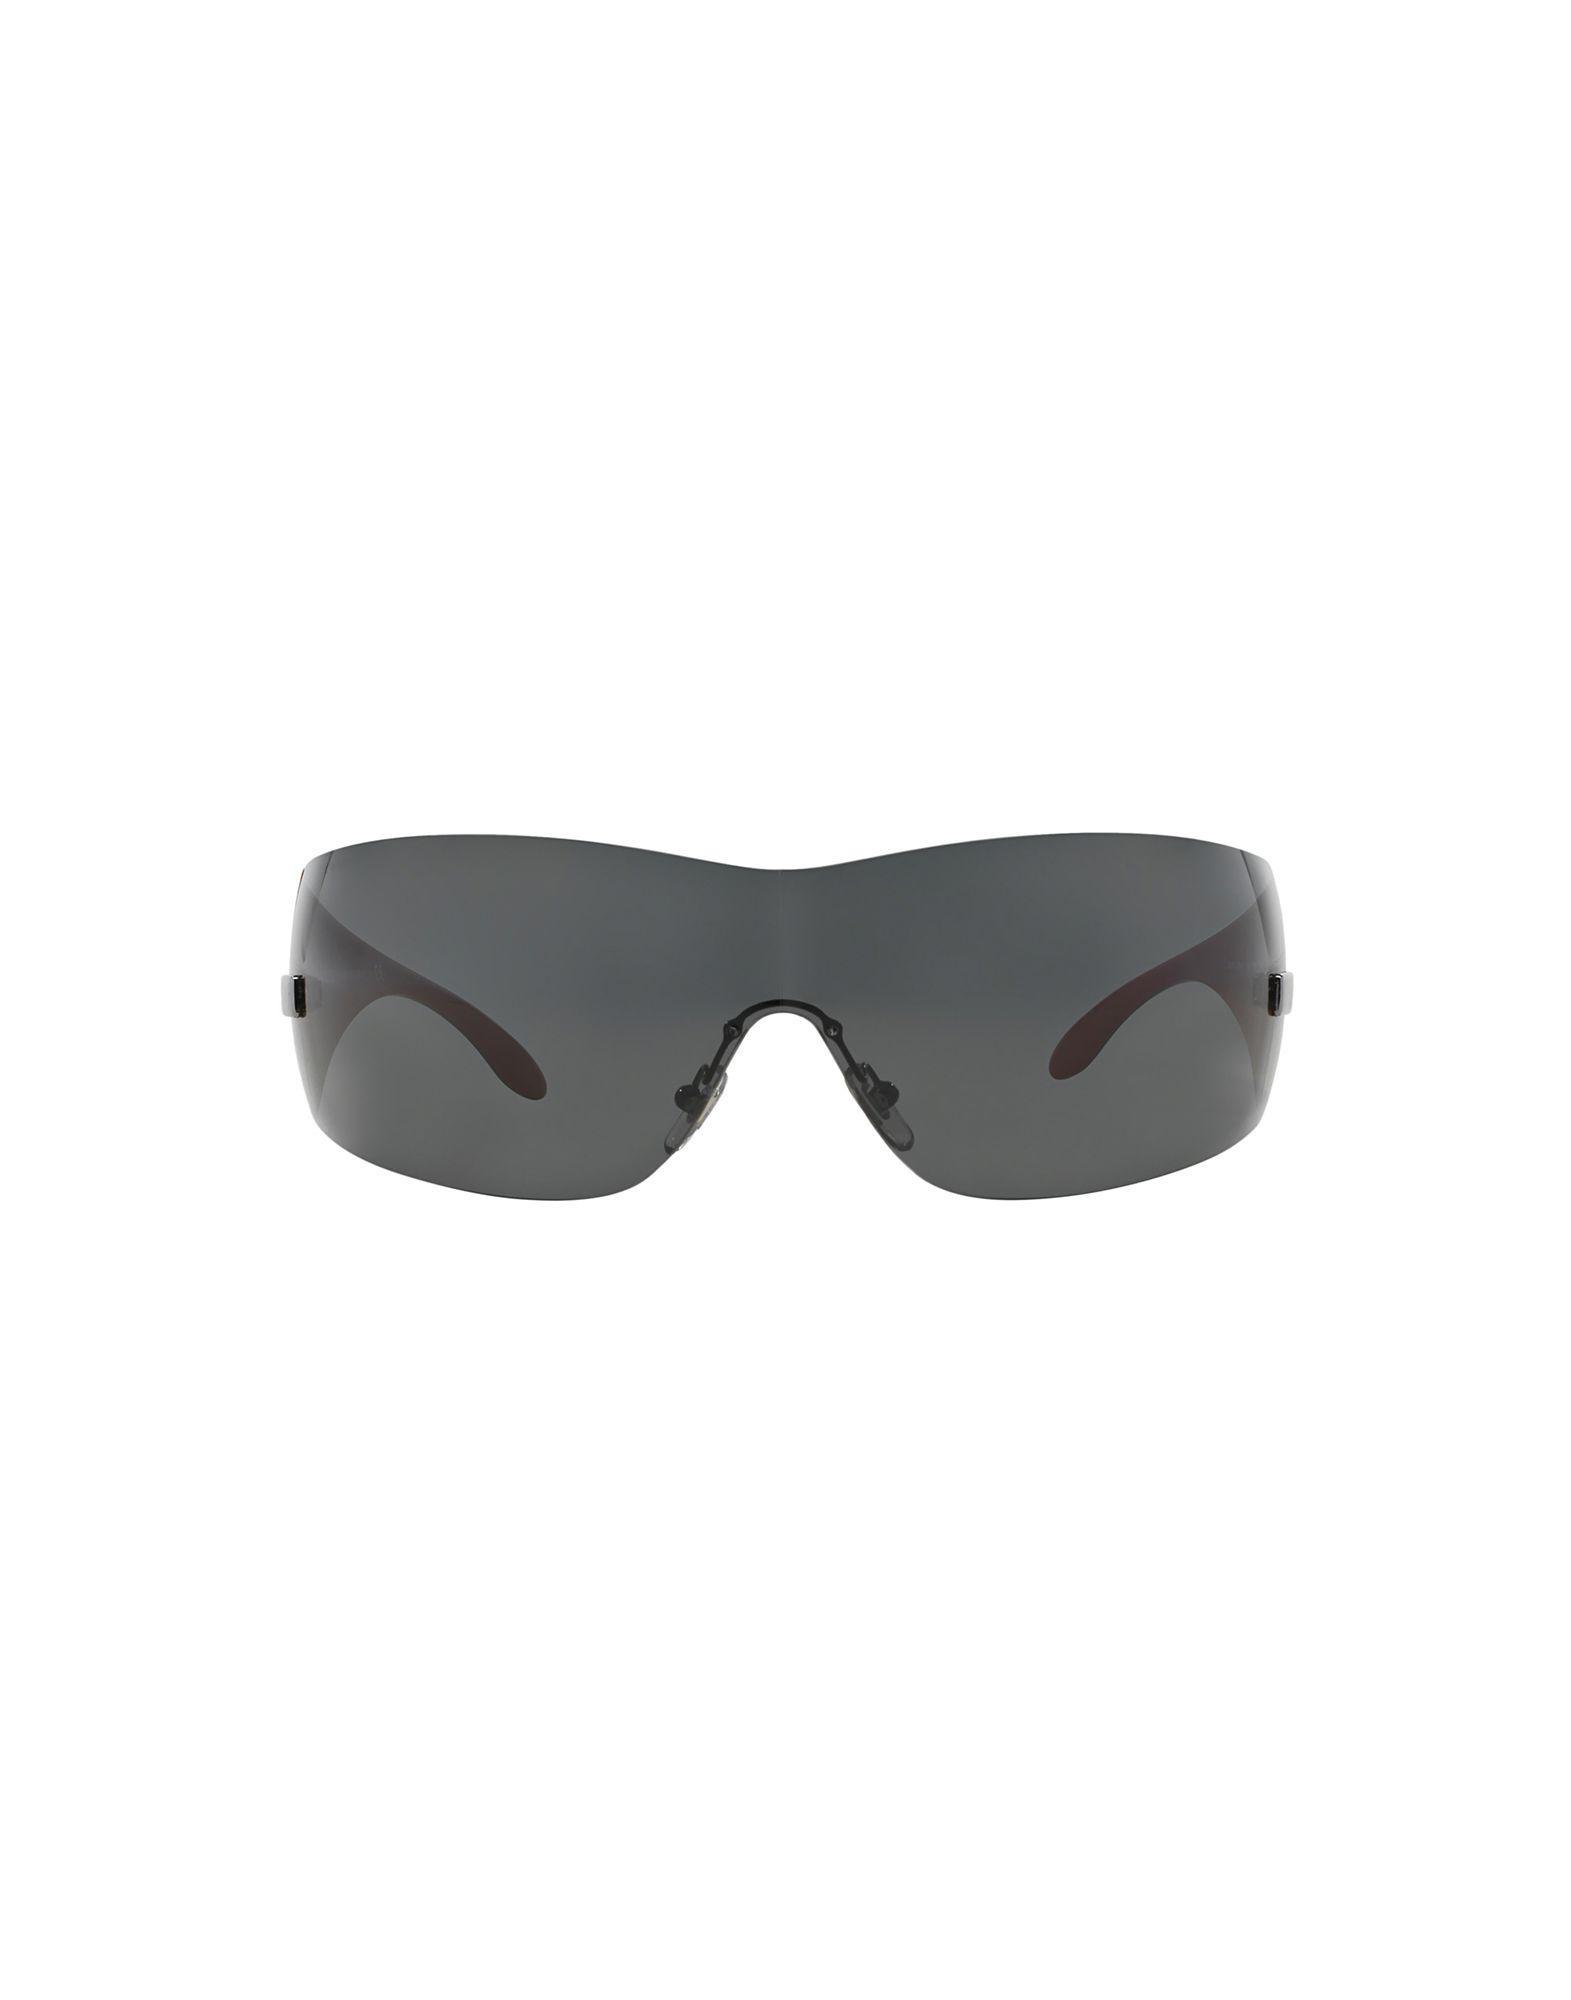 2dc883e6d717 Versace Sunglasses in Black - Lyst